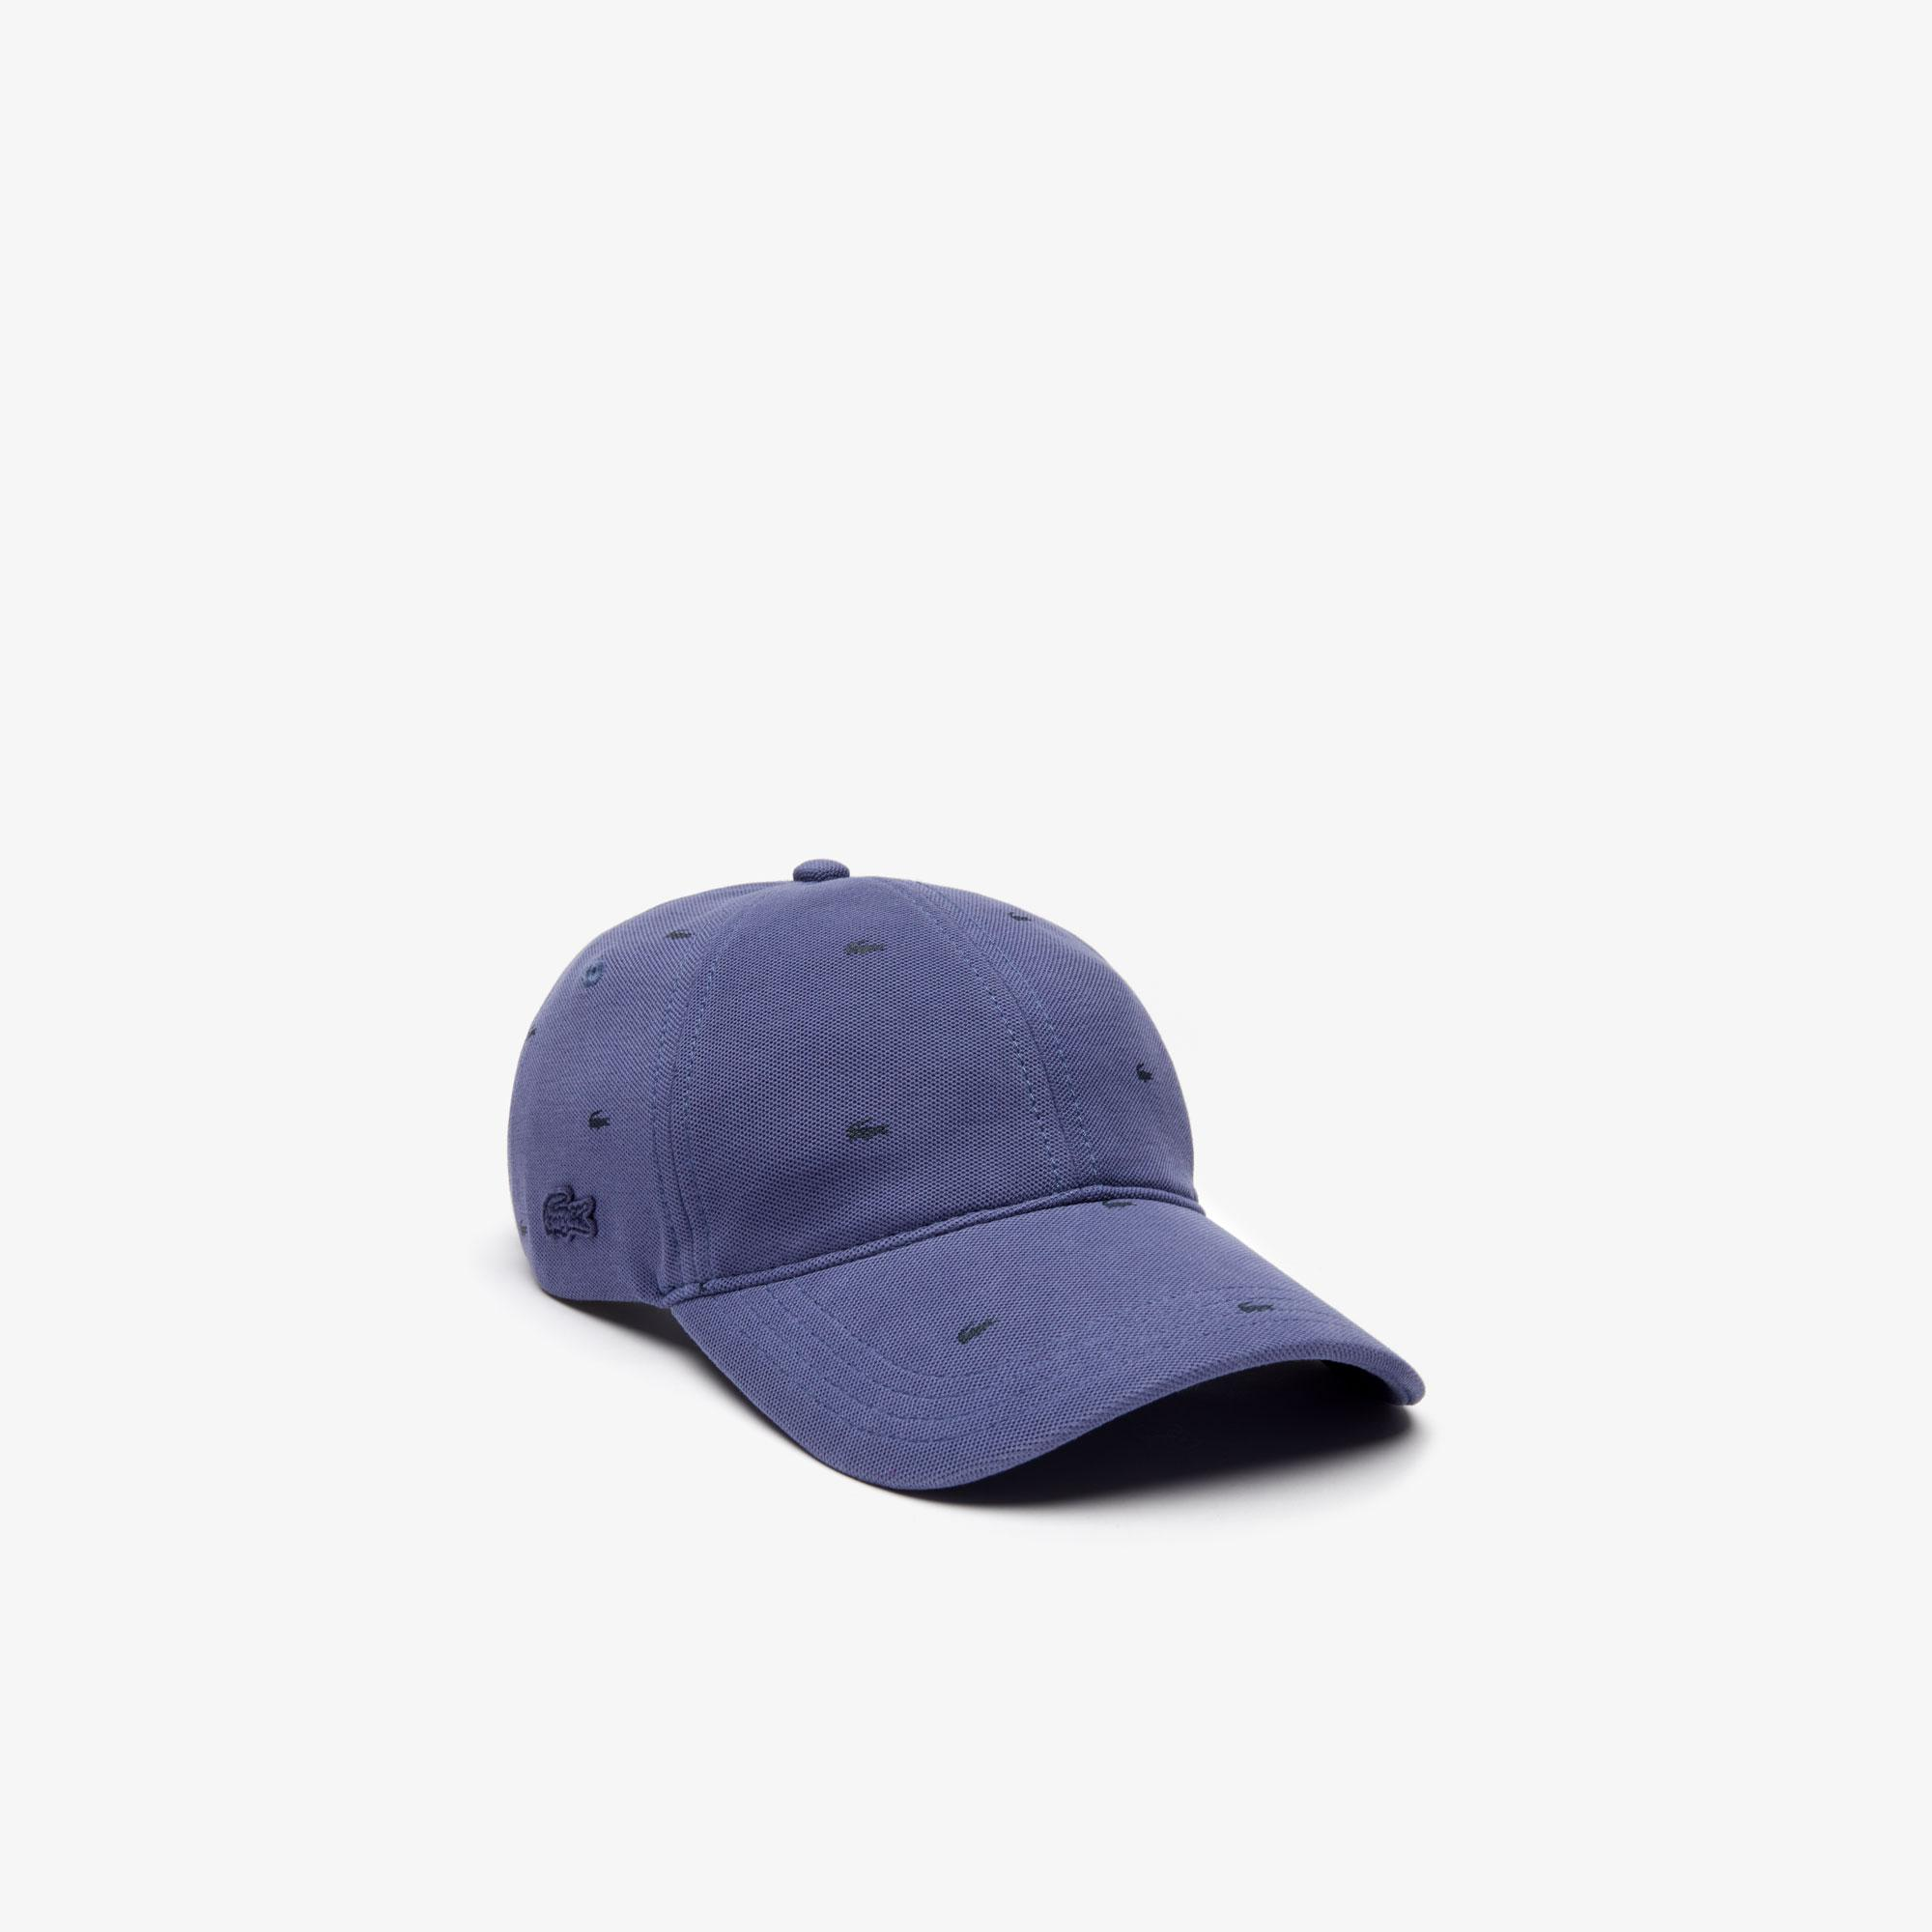 Lacoste Unisex Desenli Mavi Şapka